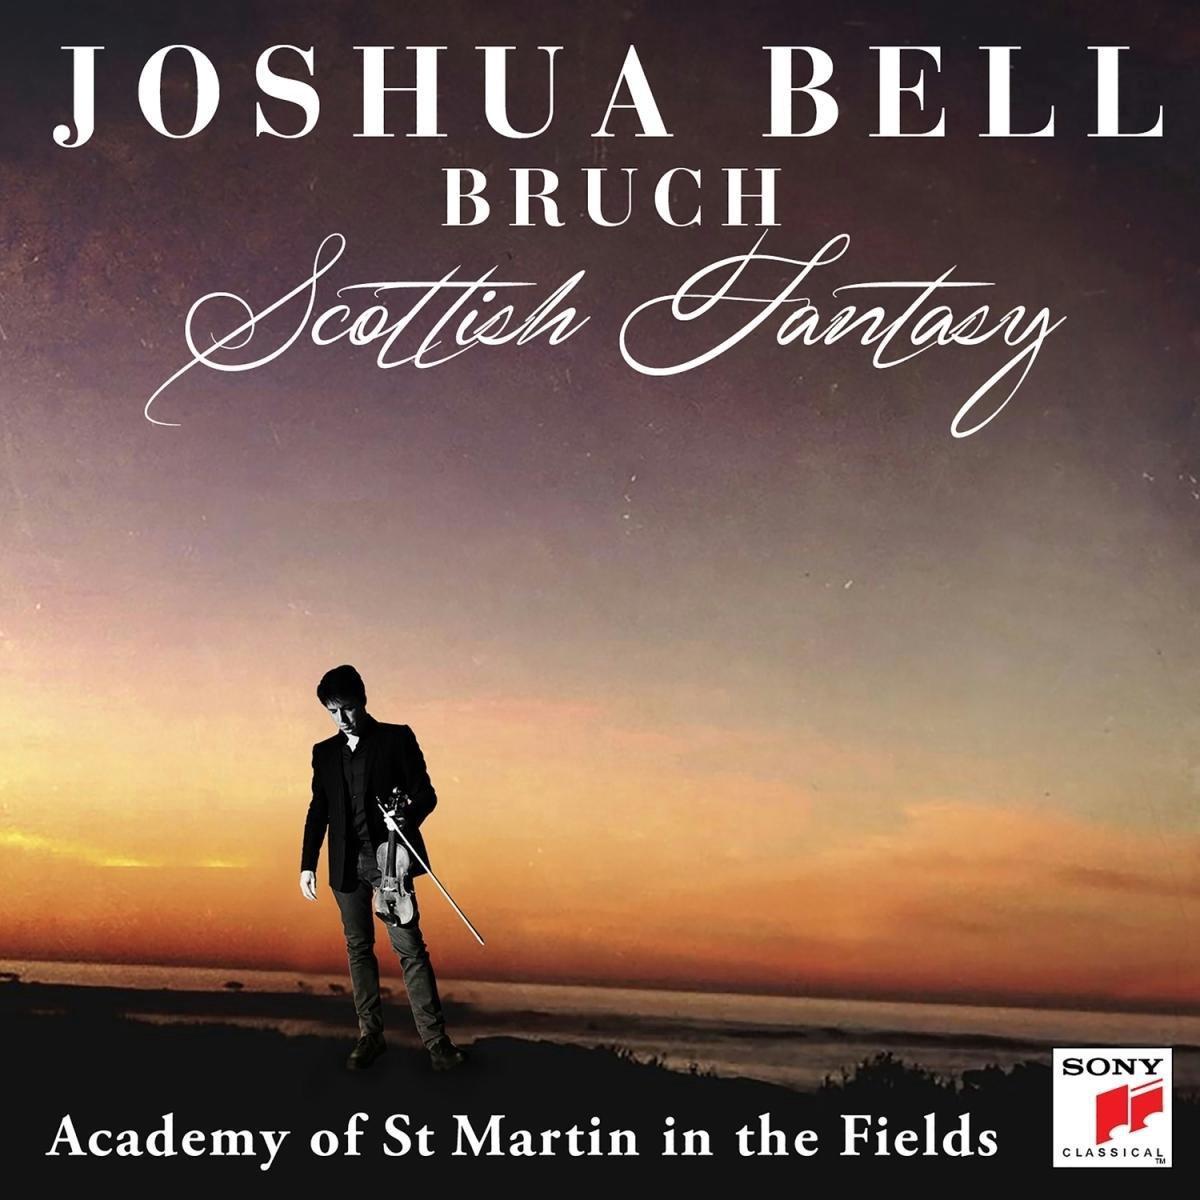 Bruch: Scottish Fantasy, Op. 46 / Violin Concerto No. 1 in G Minor, Op. 26 - M. Bruch